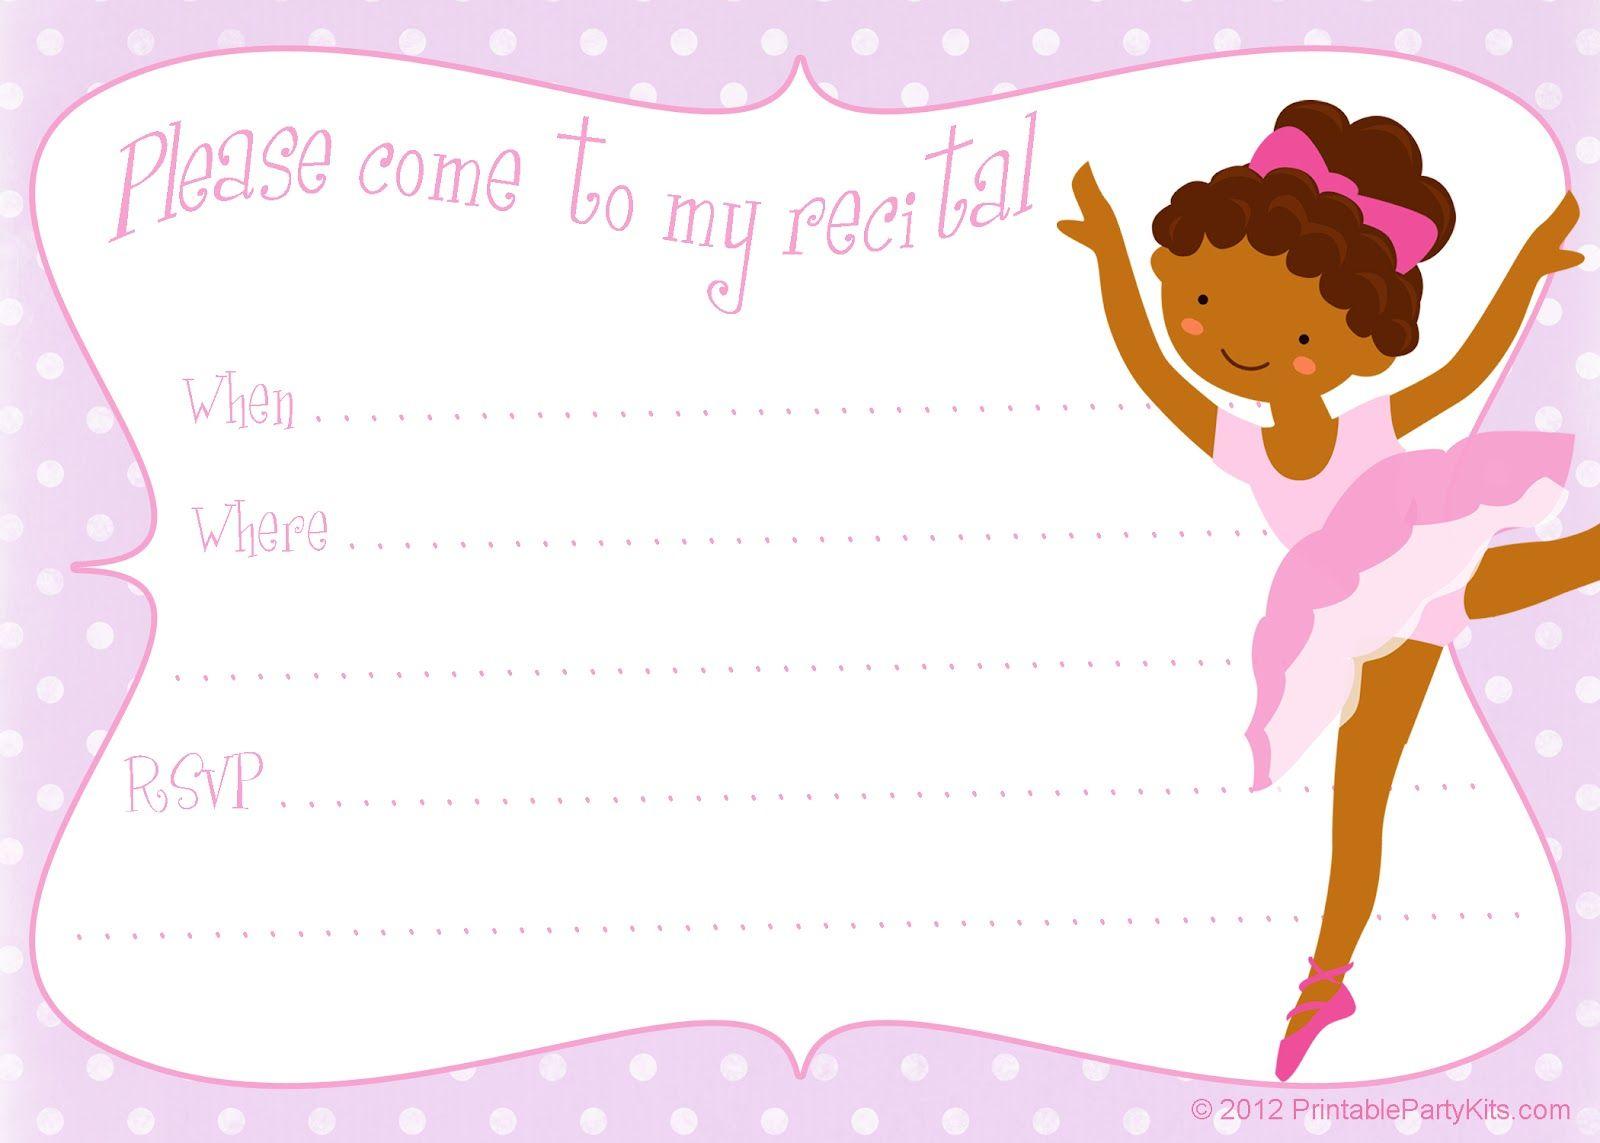 Free Printable Party Invitations: Printable Dance Recital - Free Printable Dance Recital Cards